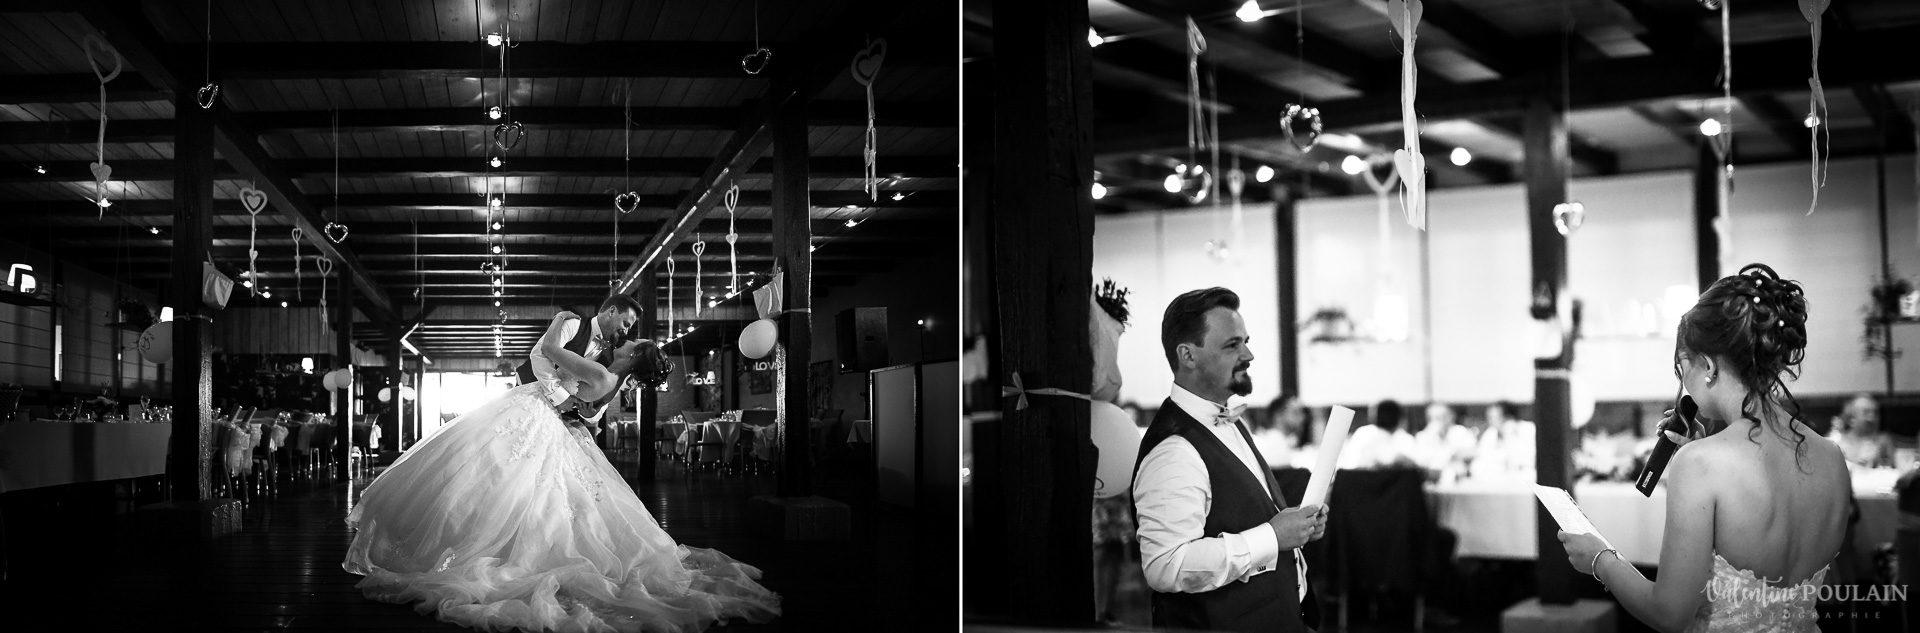 Mariage cool ferme weyerbach - Valentine Poulain n&b